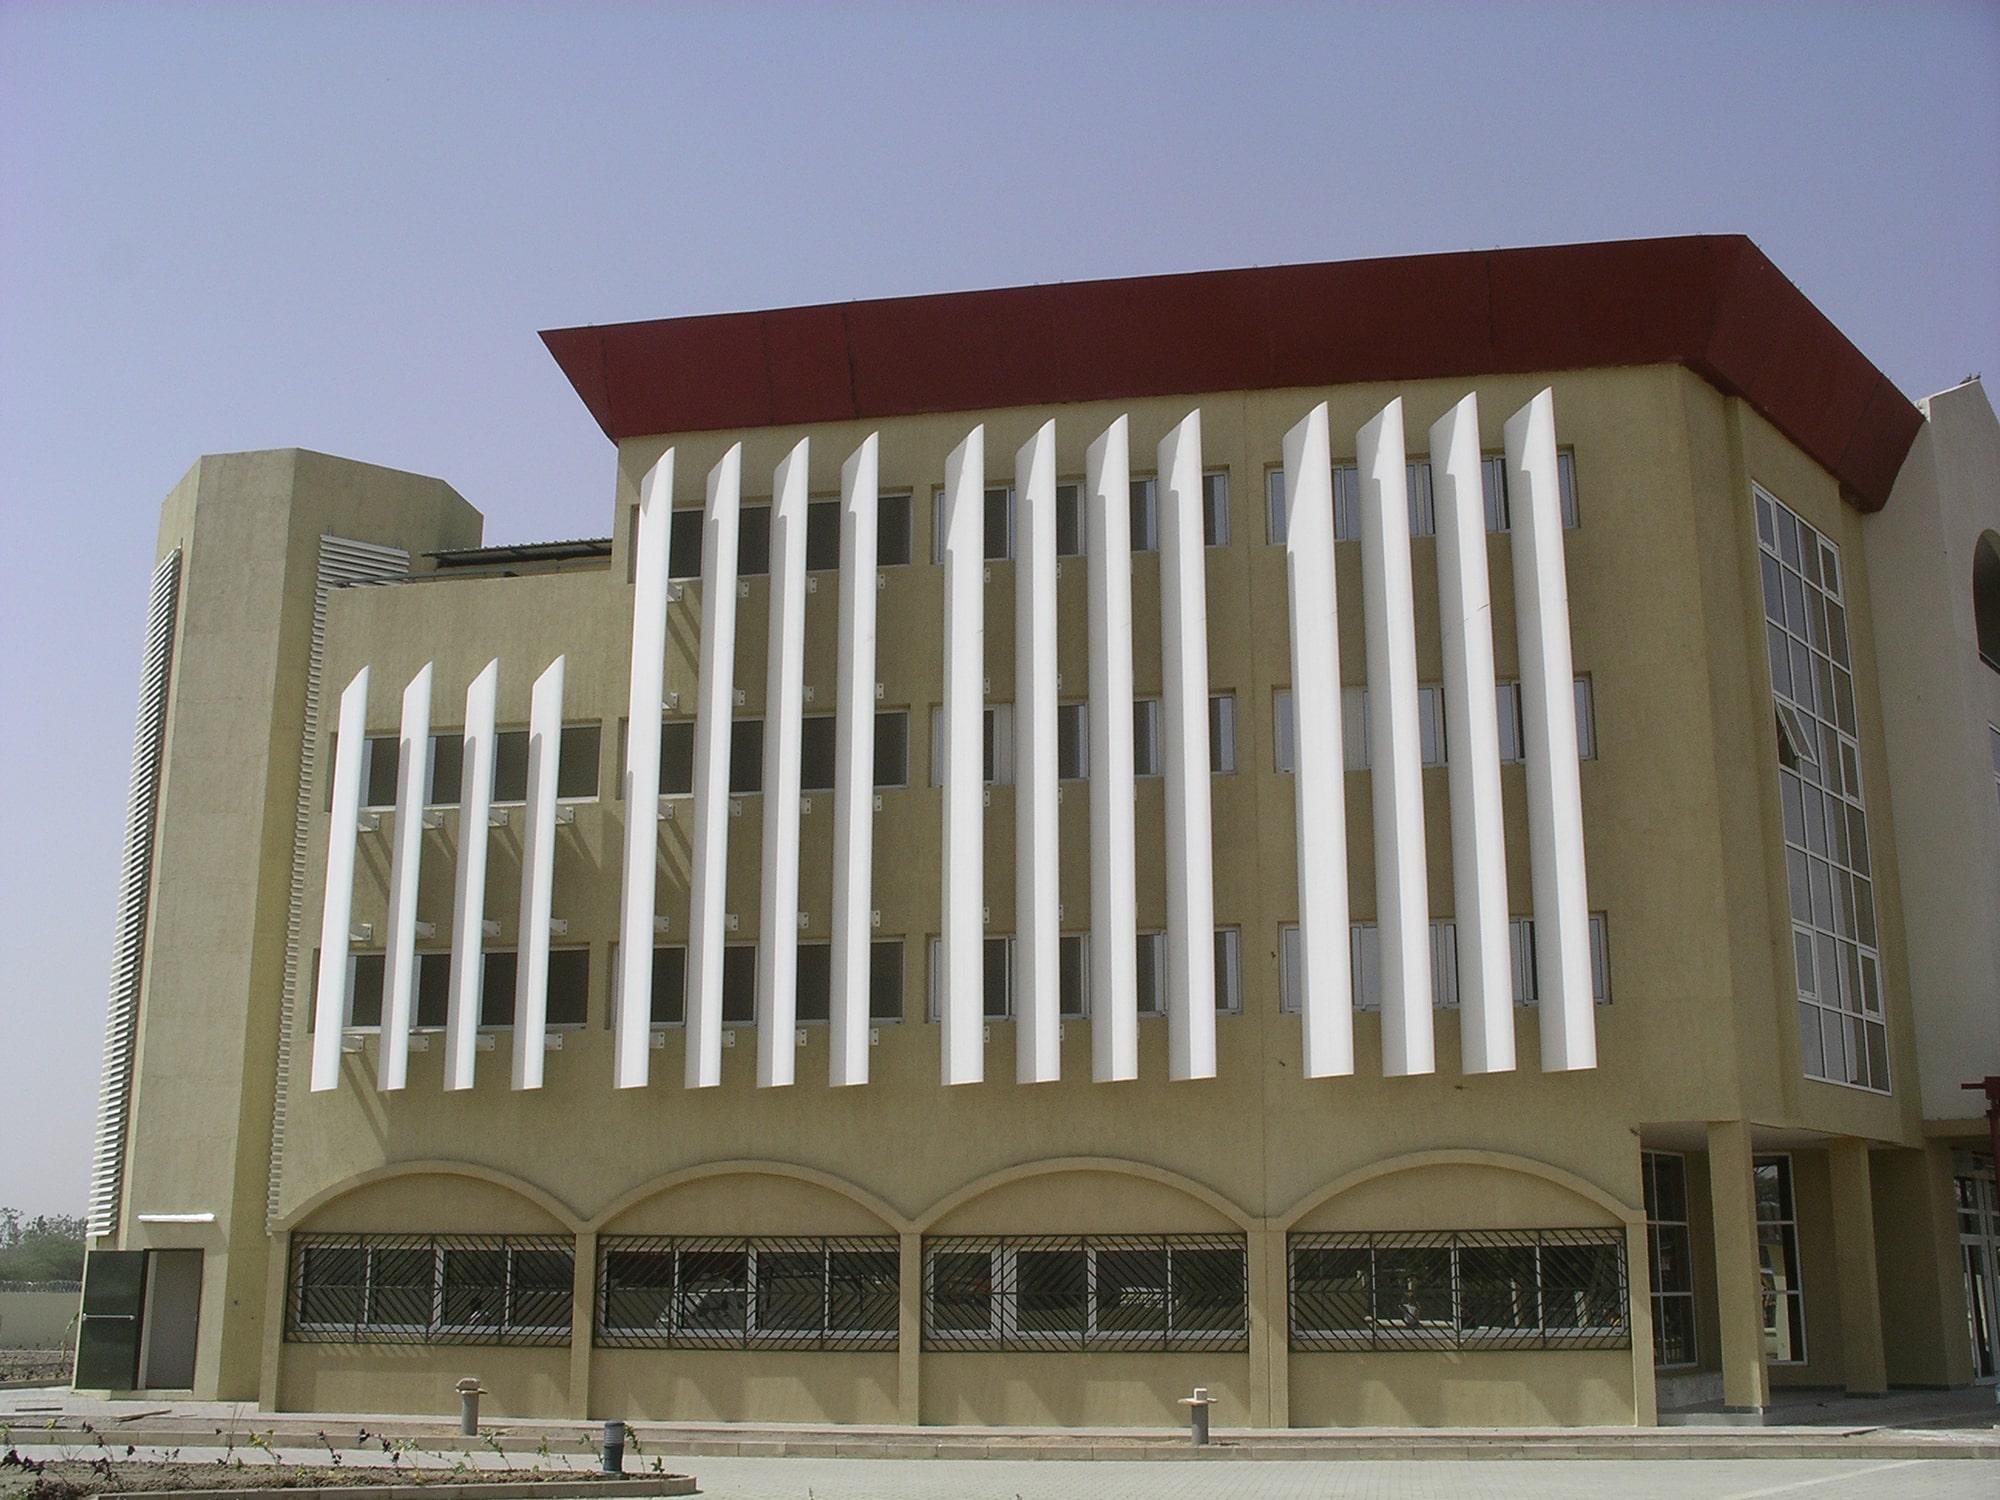 Siège De La Cebevirha N'djamena : Menuiseries Ext. AluBrise Soleil 4